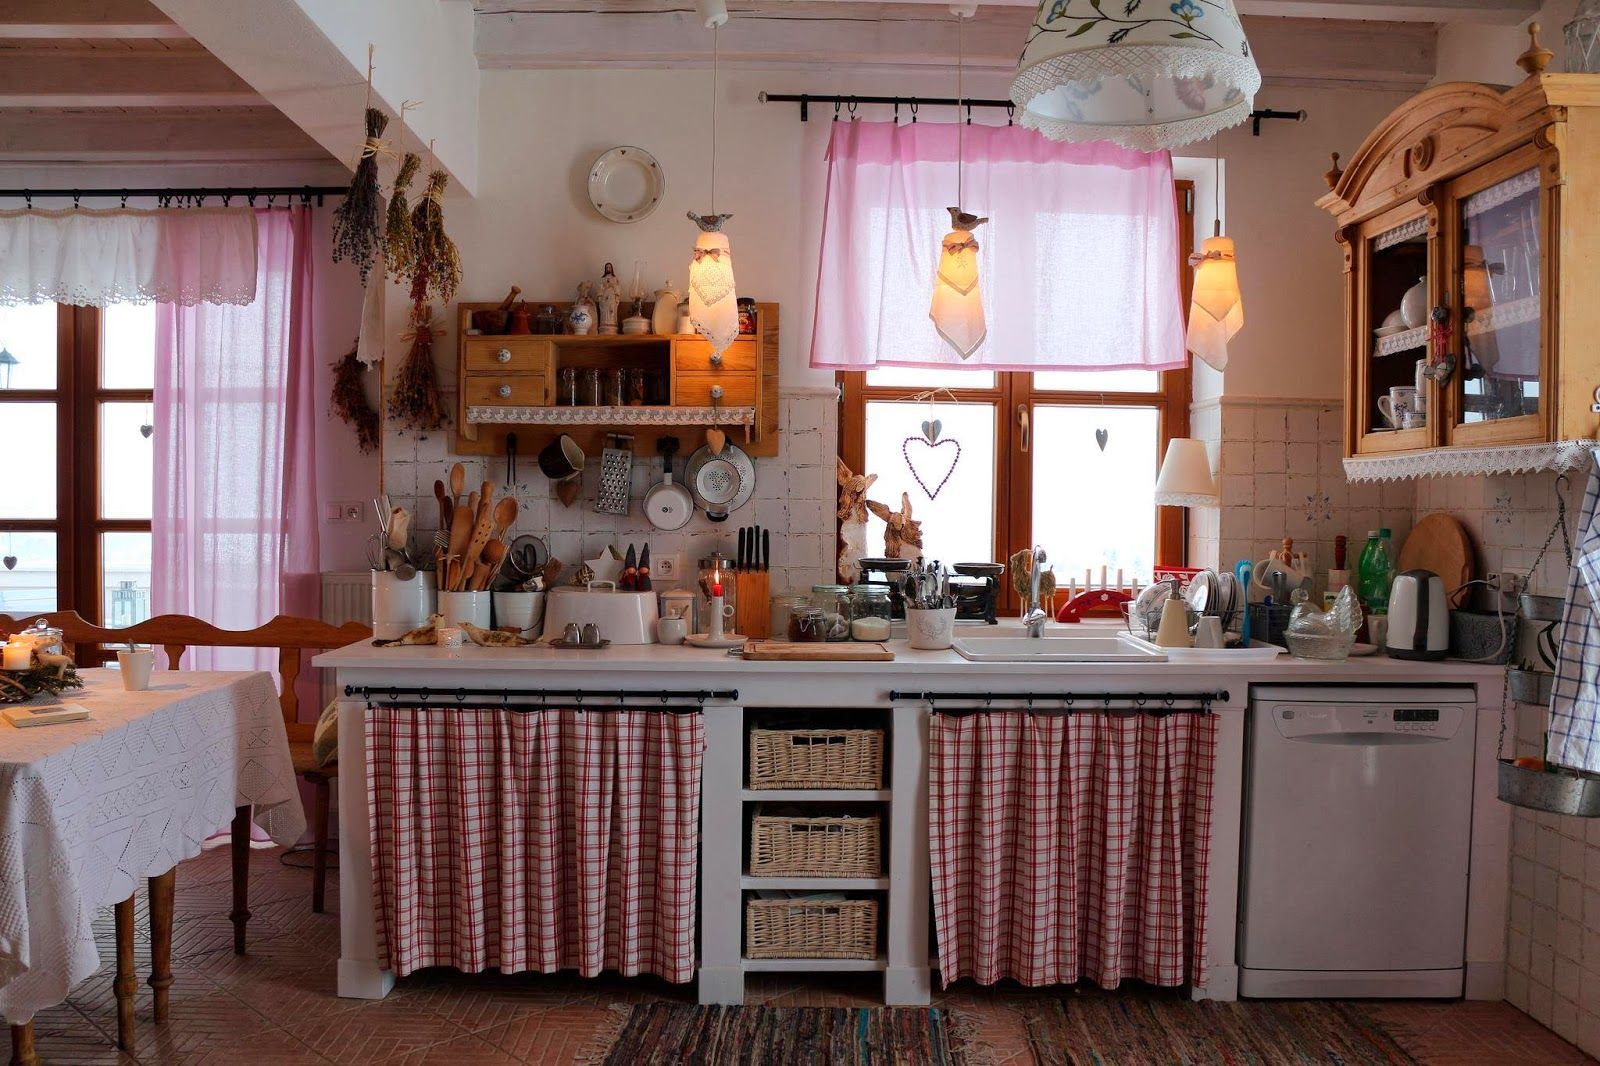 Cocina antigua cocinas tradicionales pinterest for Cocinas antiguas